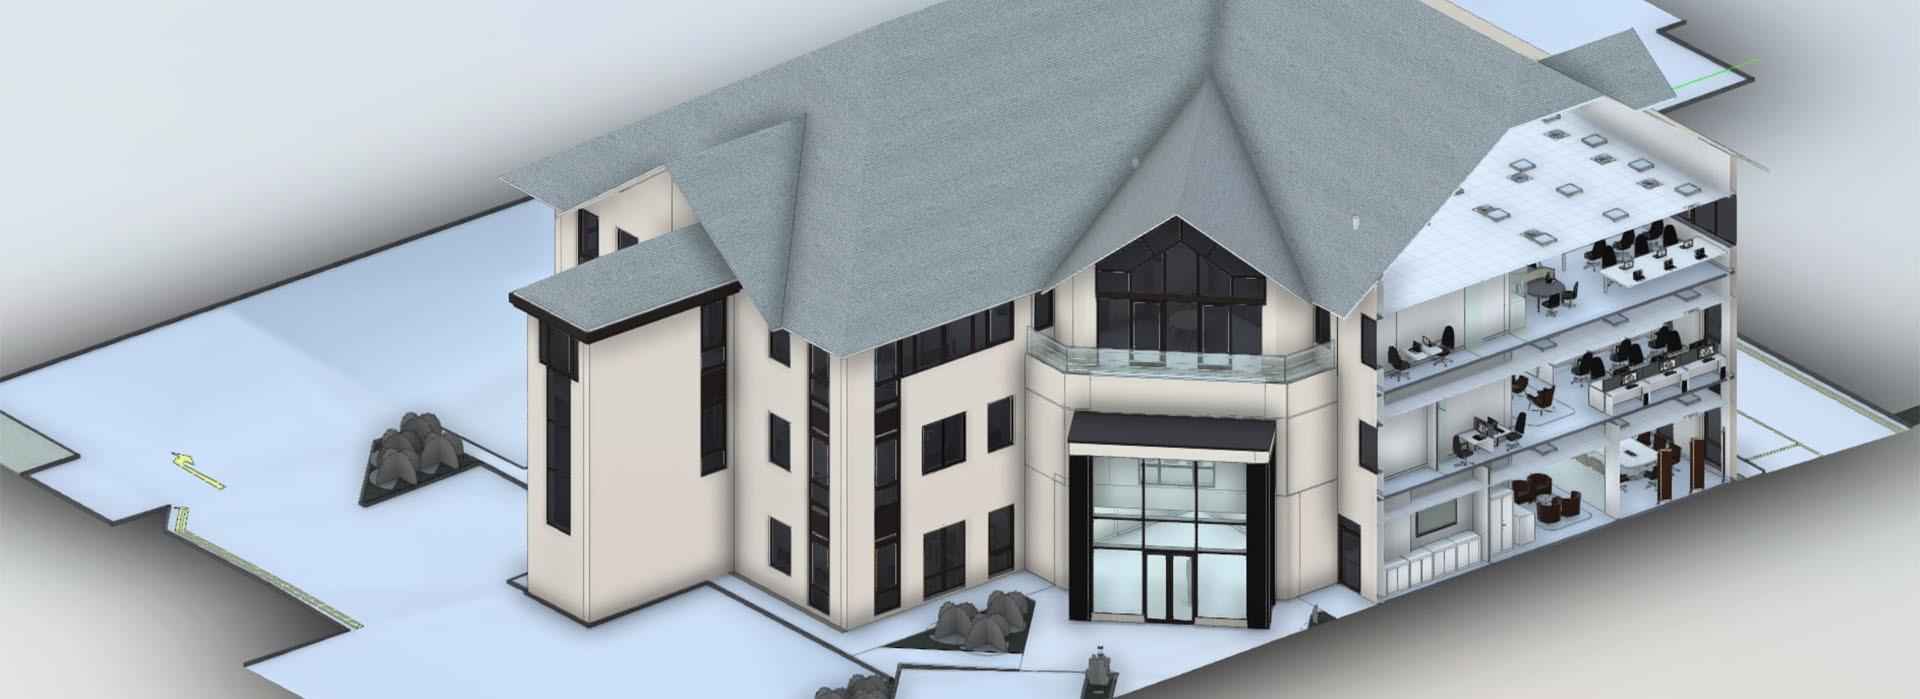 Measured Building Surveys by Vision Engineering